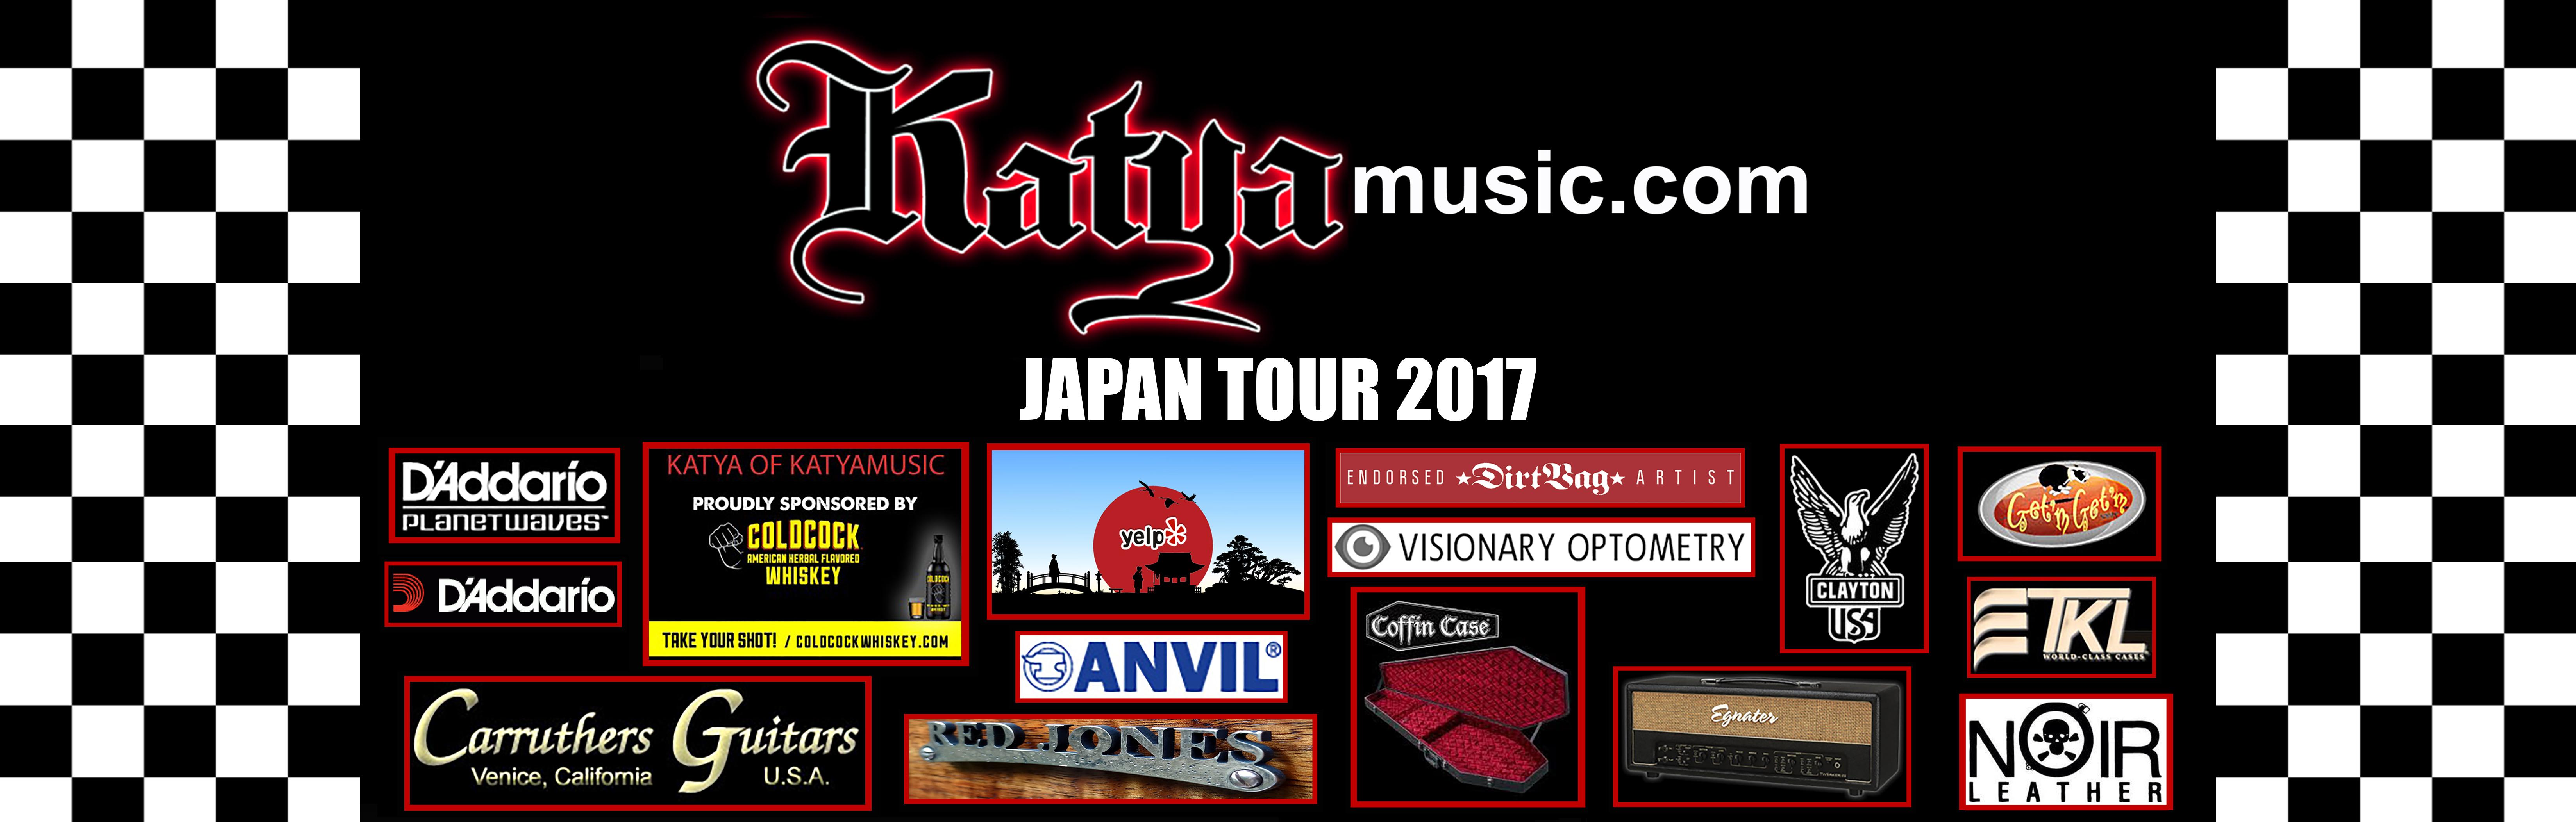 KATYA 2017 JAPAN TOUR